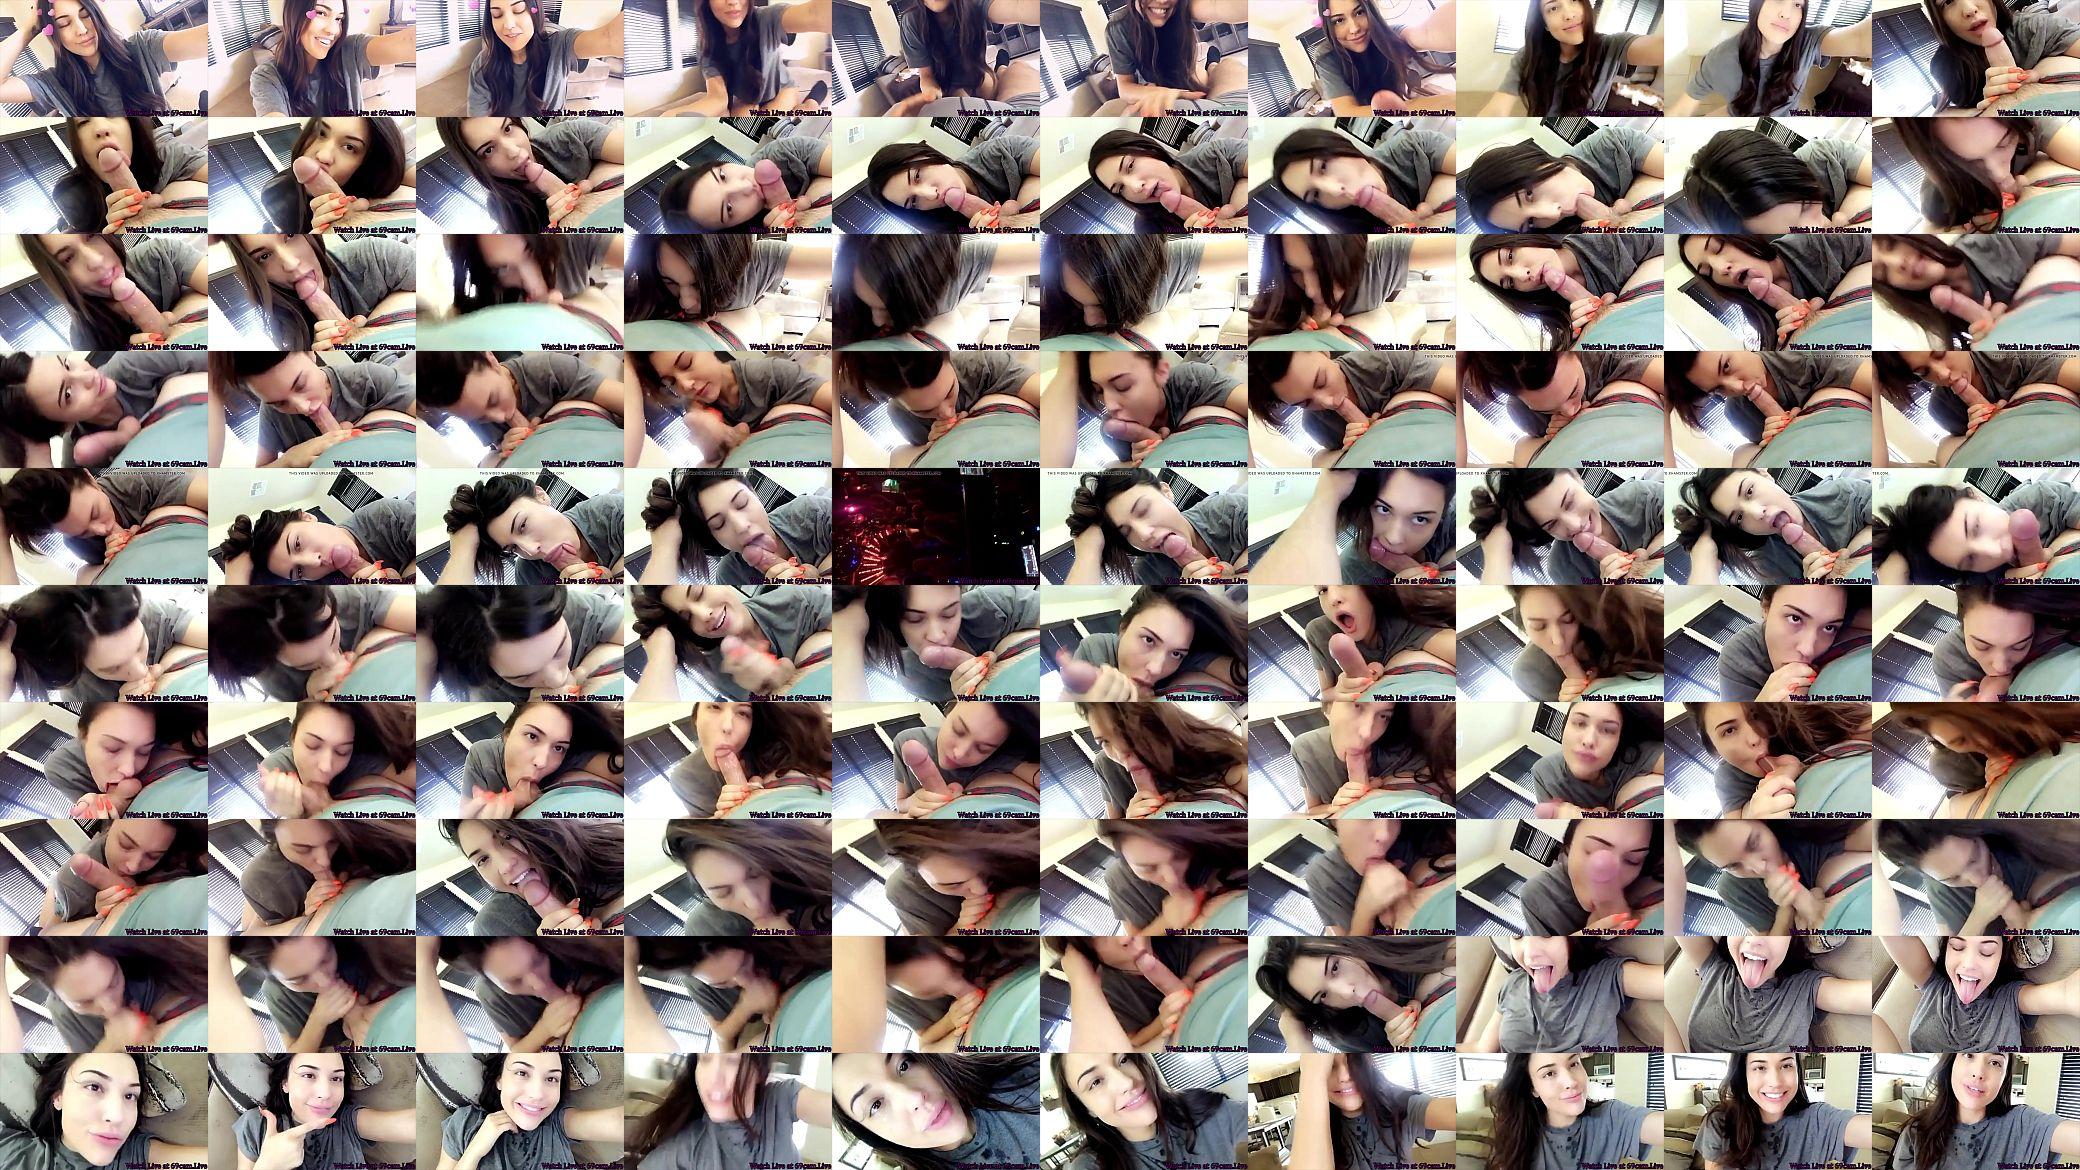 excellent idea webcam dildo show with horny chick thanks for